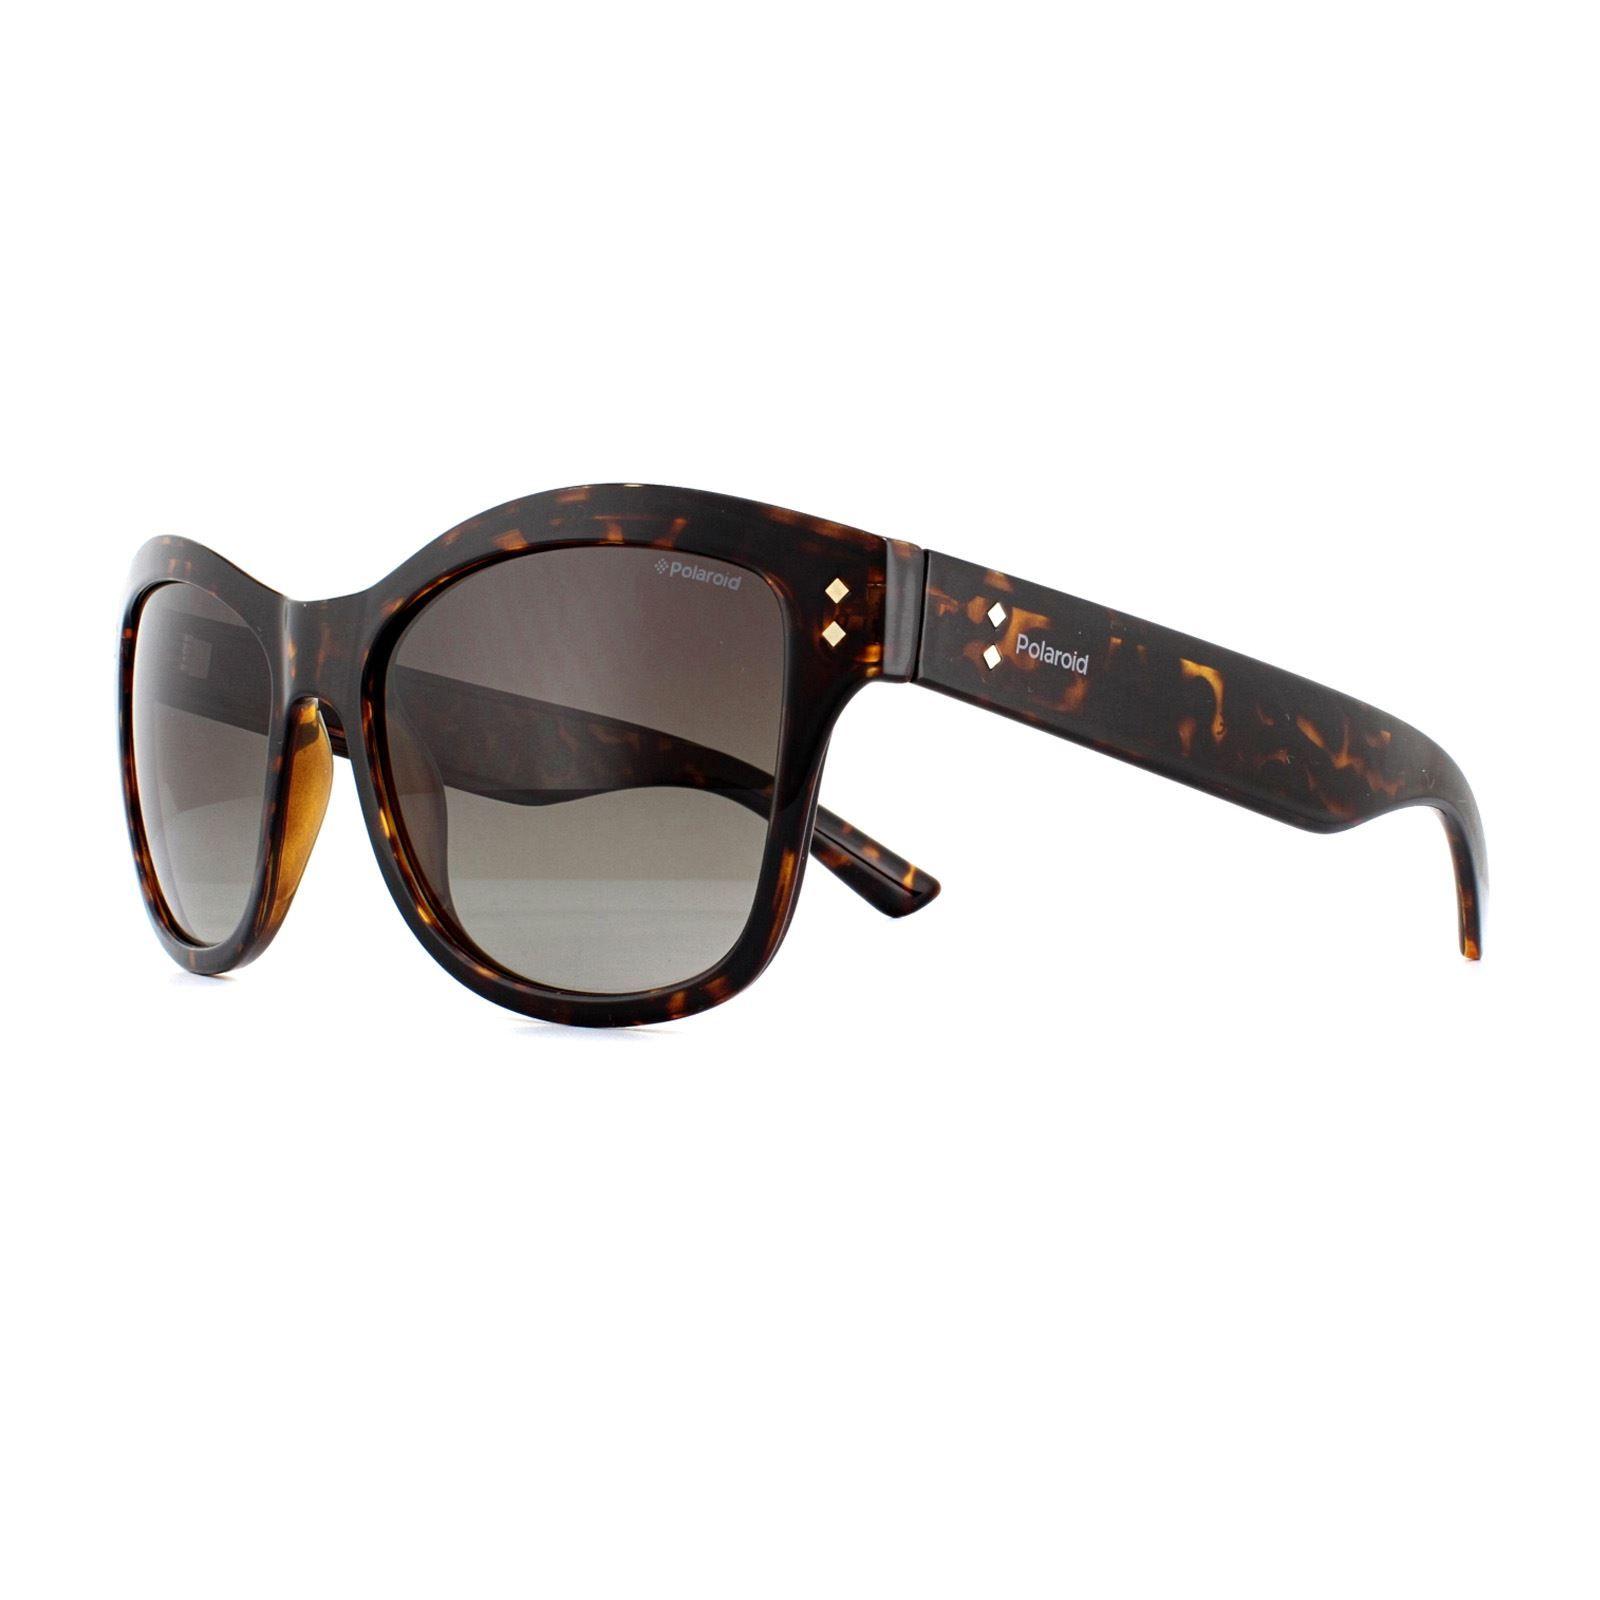 Polaroid Sunglasses PLD 4034/S 086 94 Dark Havana Brown Gradient Polarized